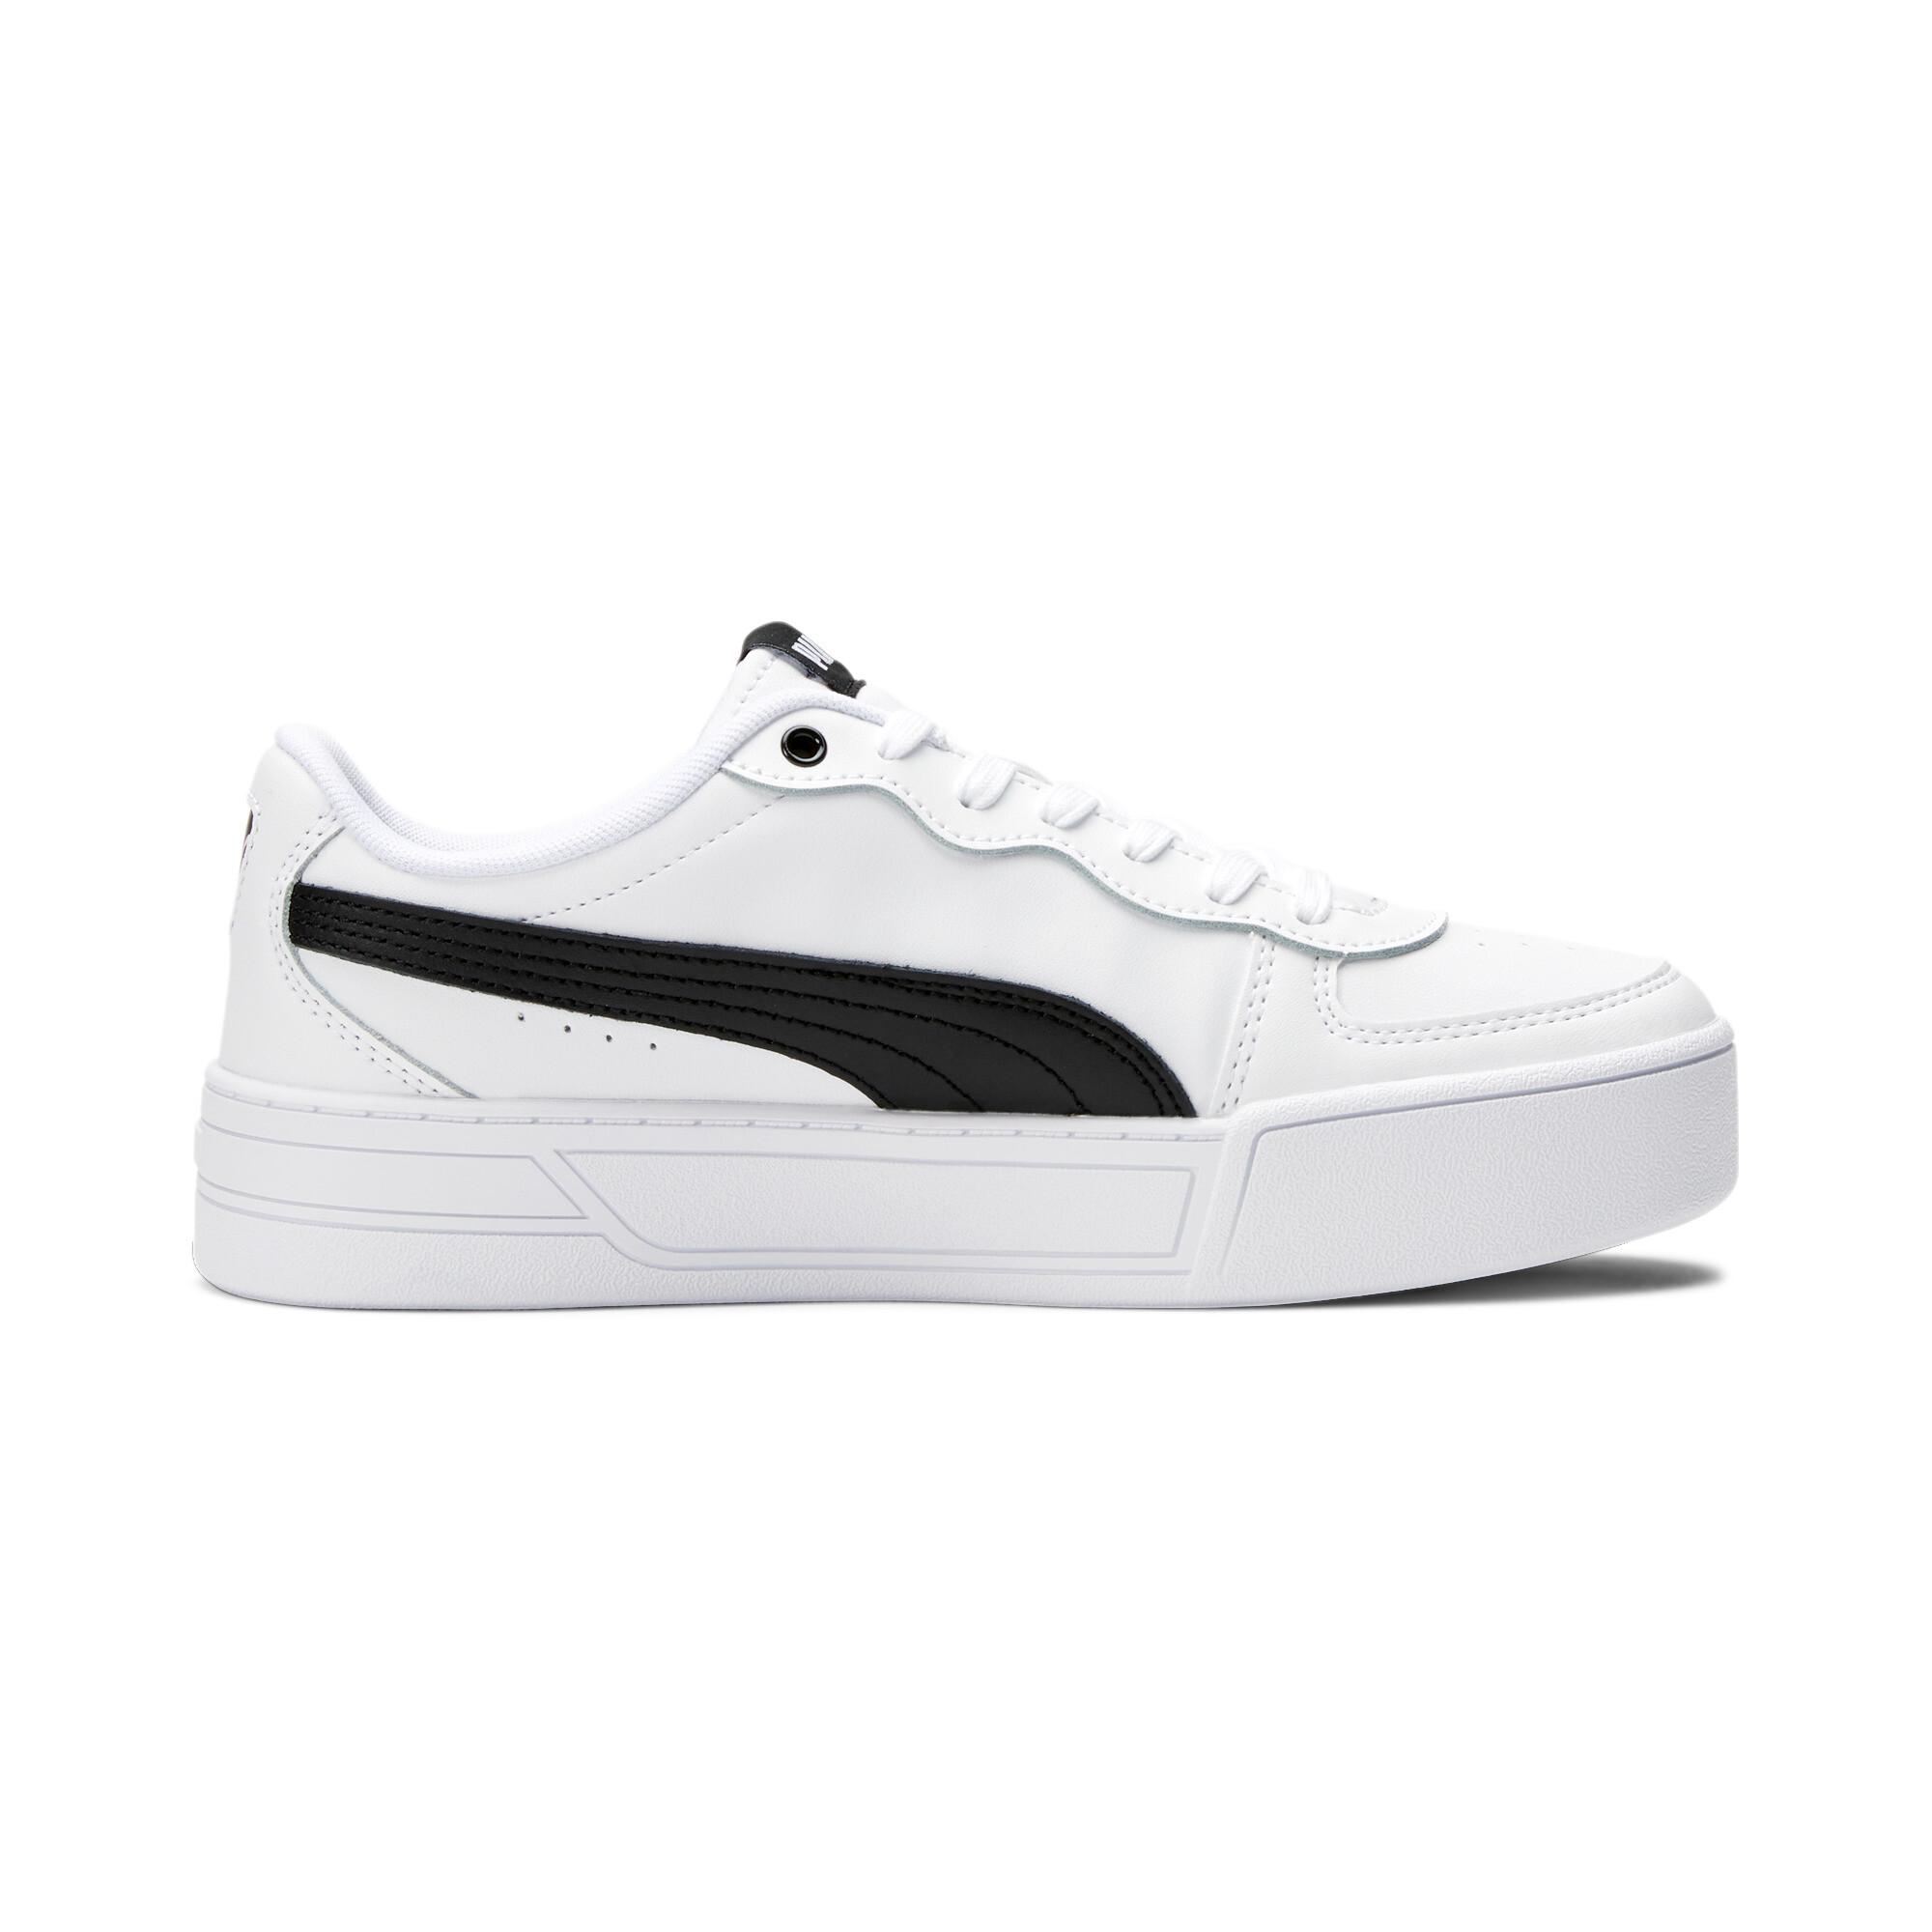 PUMA-Women-039-s-Skye-Sneakers thumbnail 6